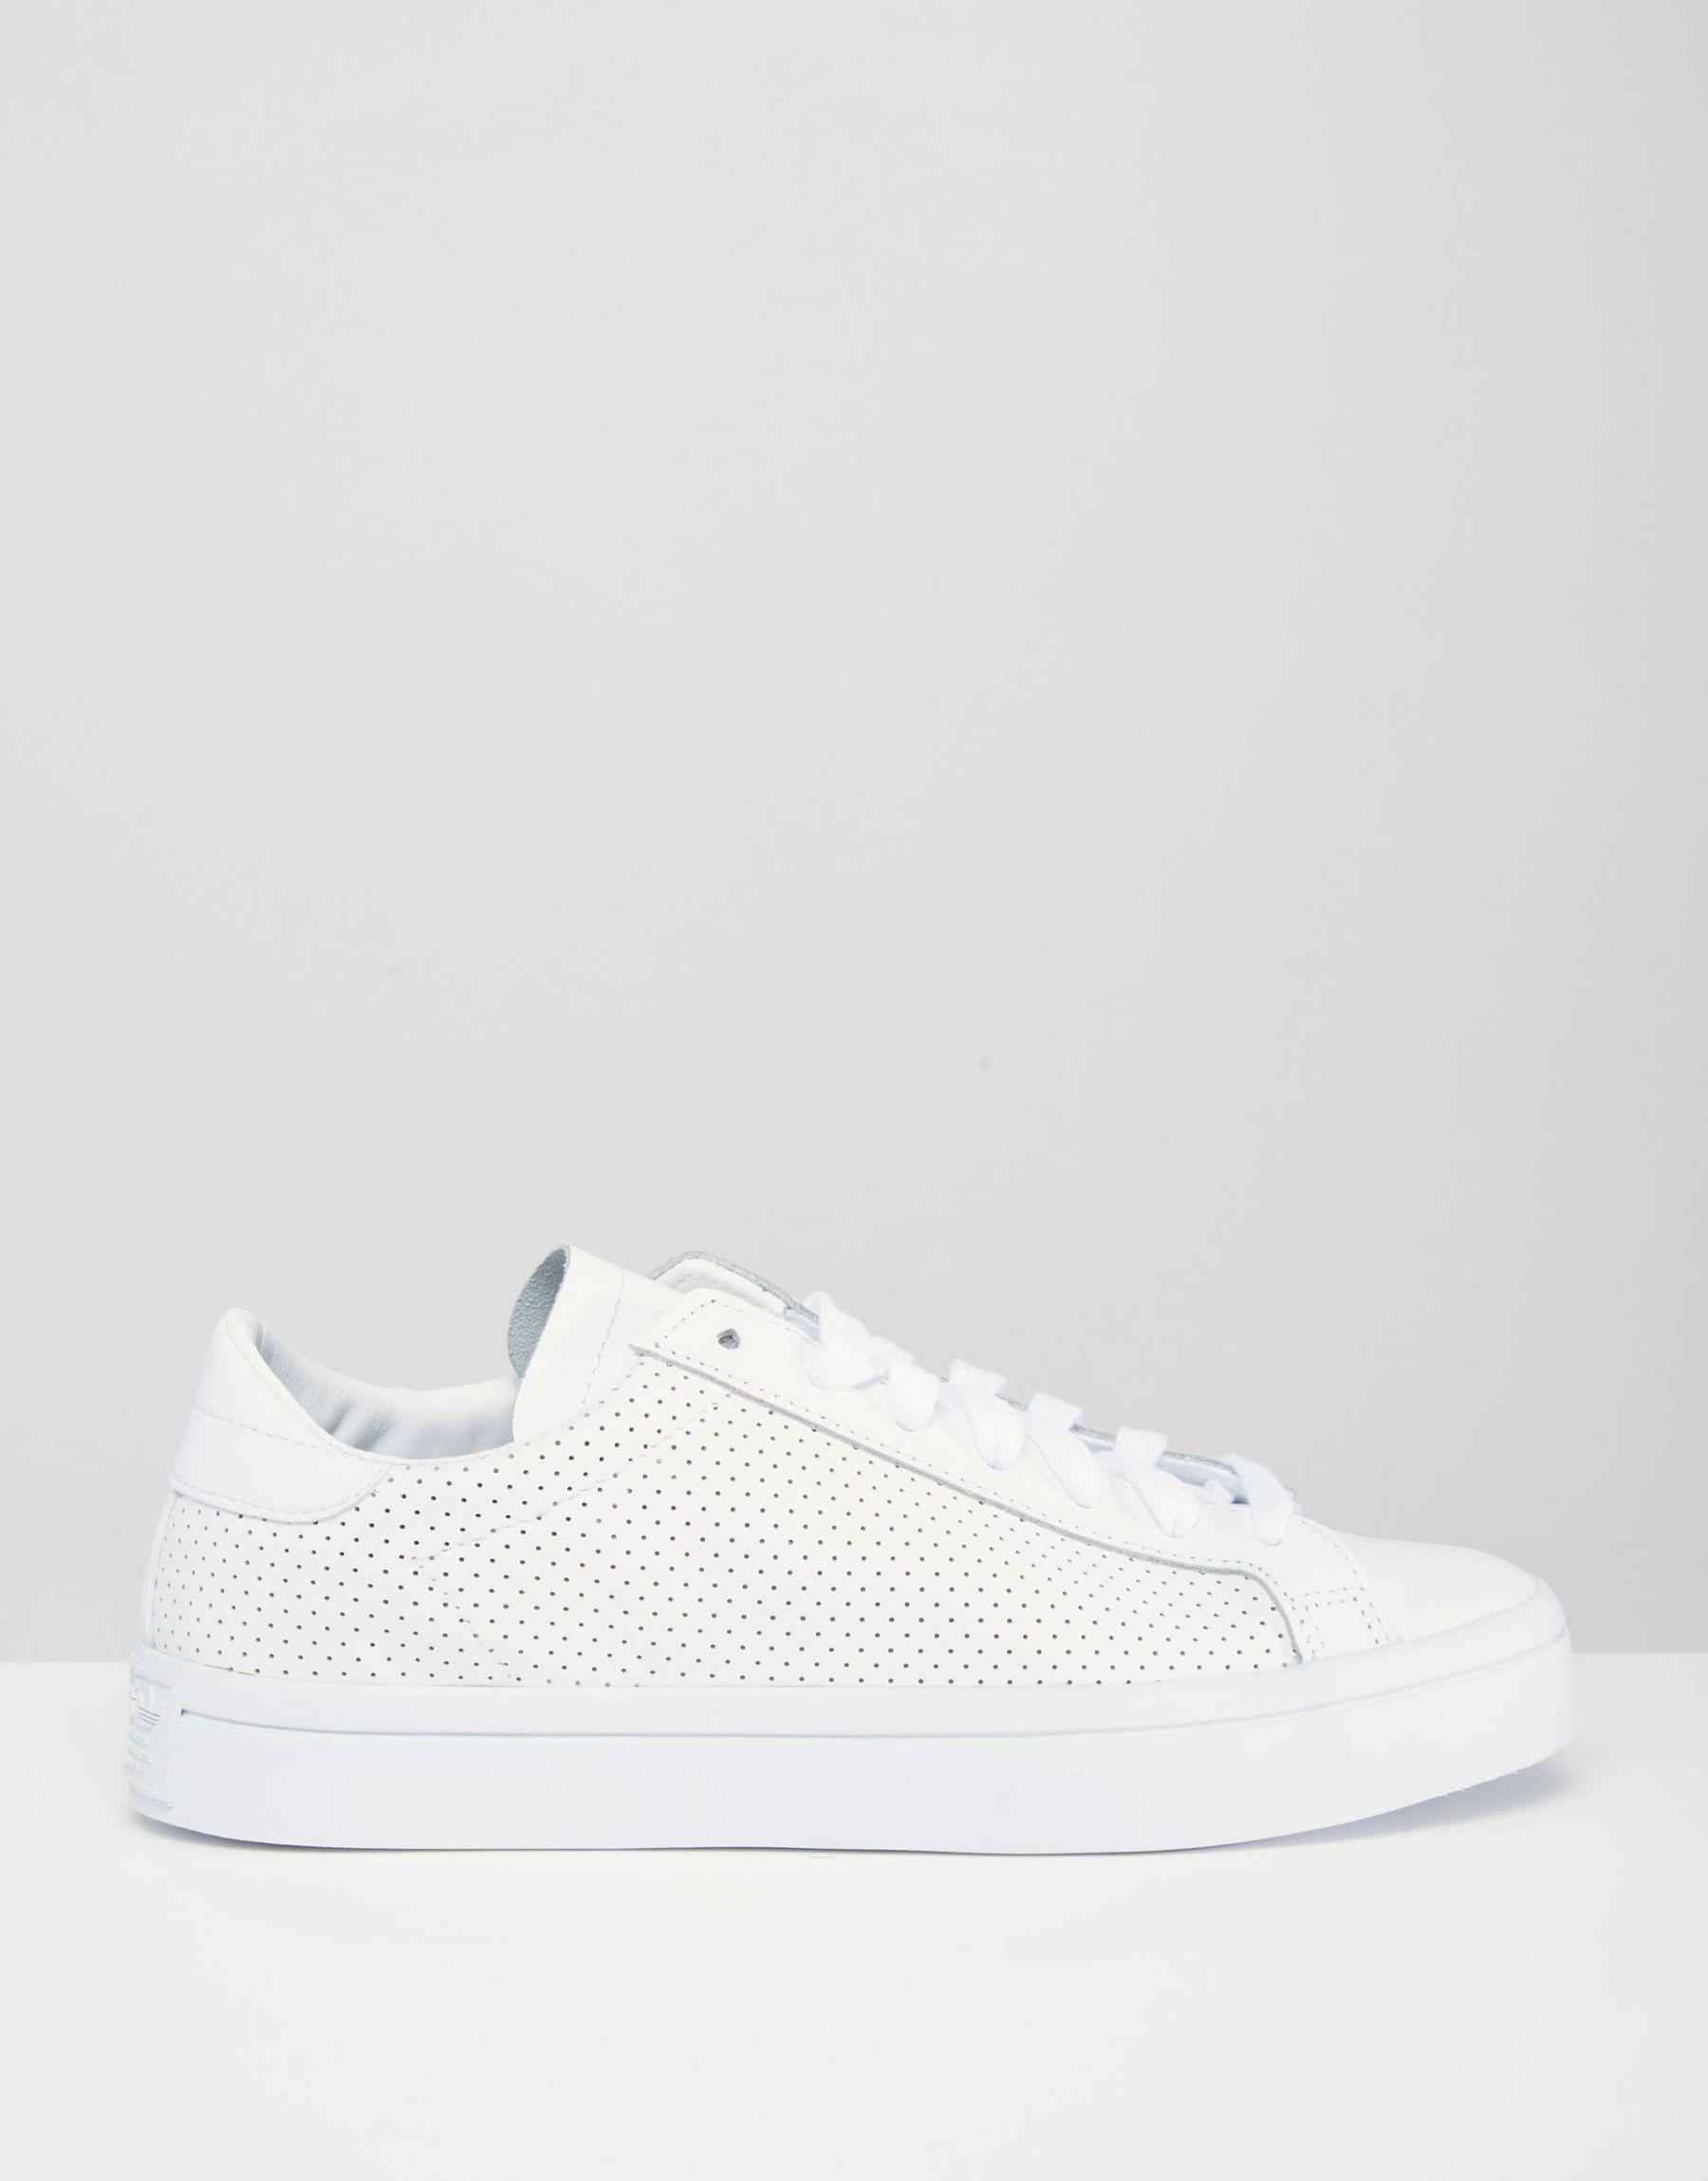 Court Vantage Perforated Leather Sneakers adidas Originals M3ZecgLS